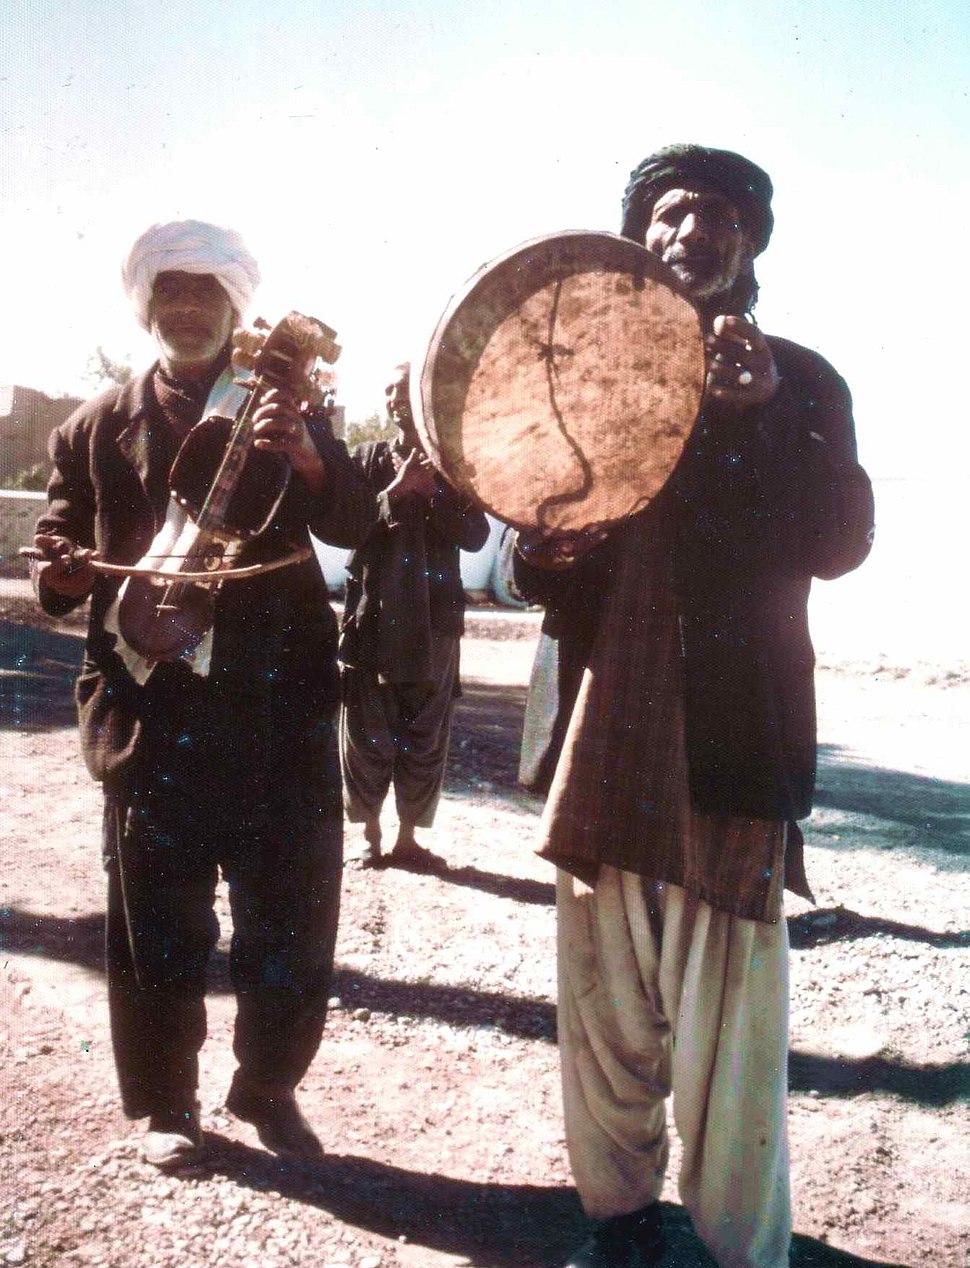 Minstrels, Herat, 1973